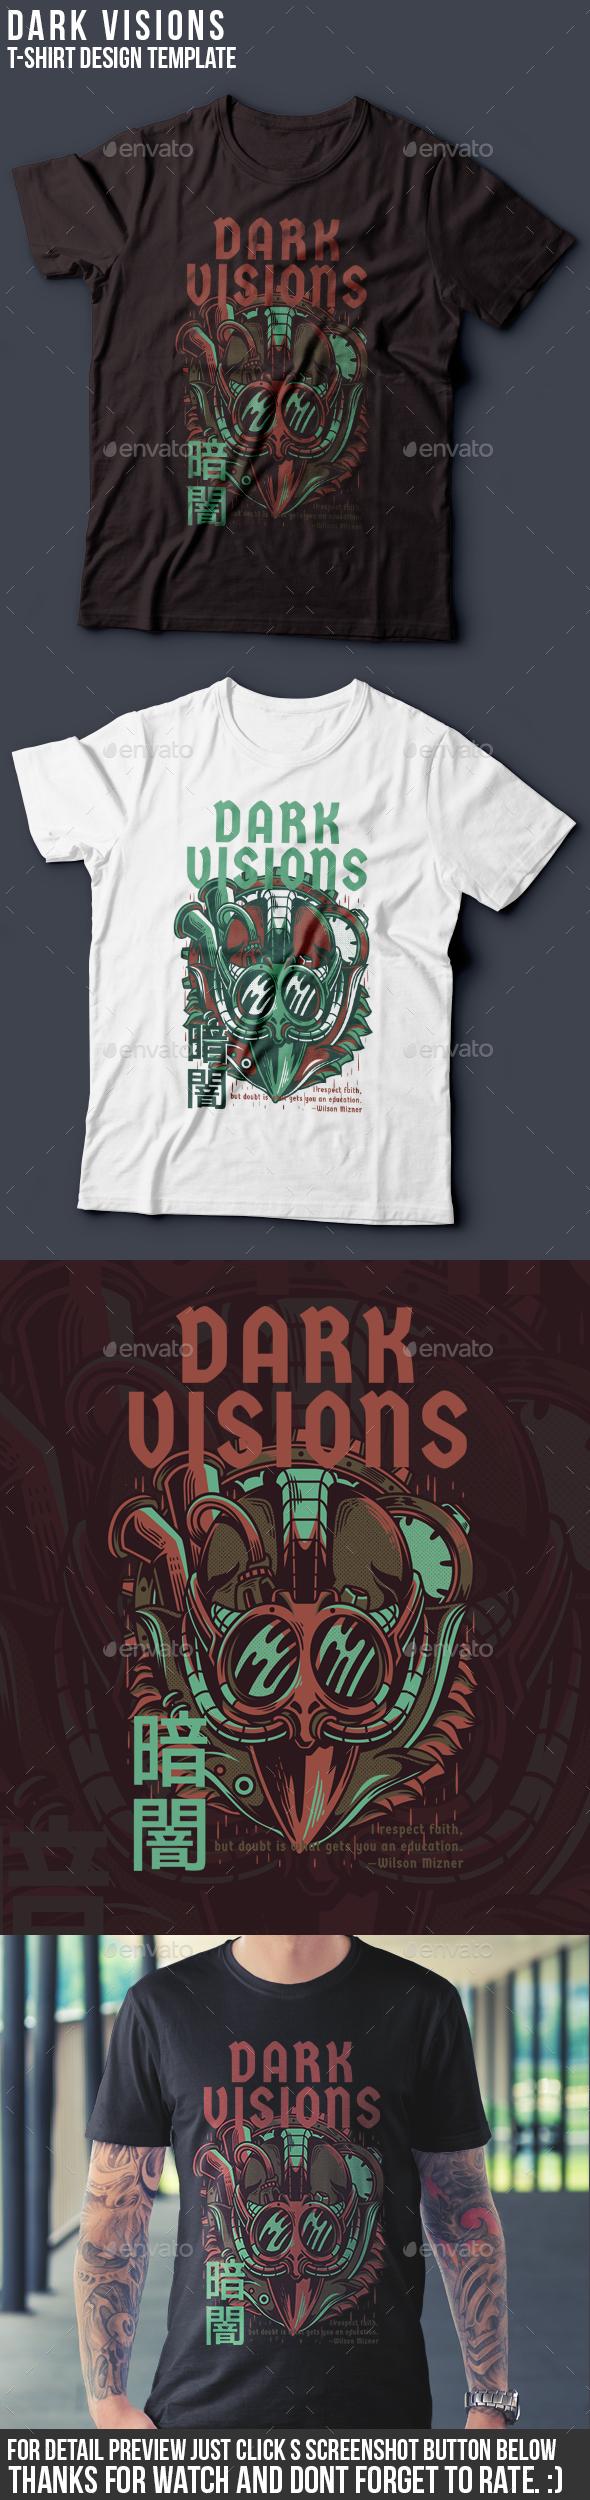 Dark Visions T-Shirt Design